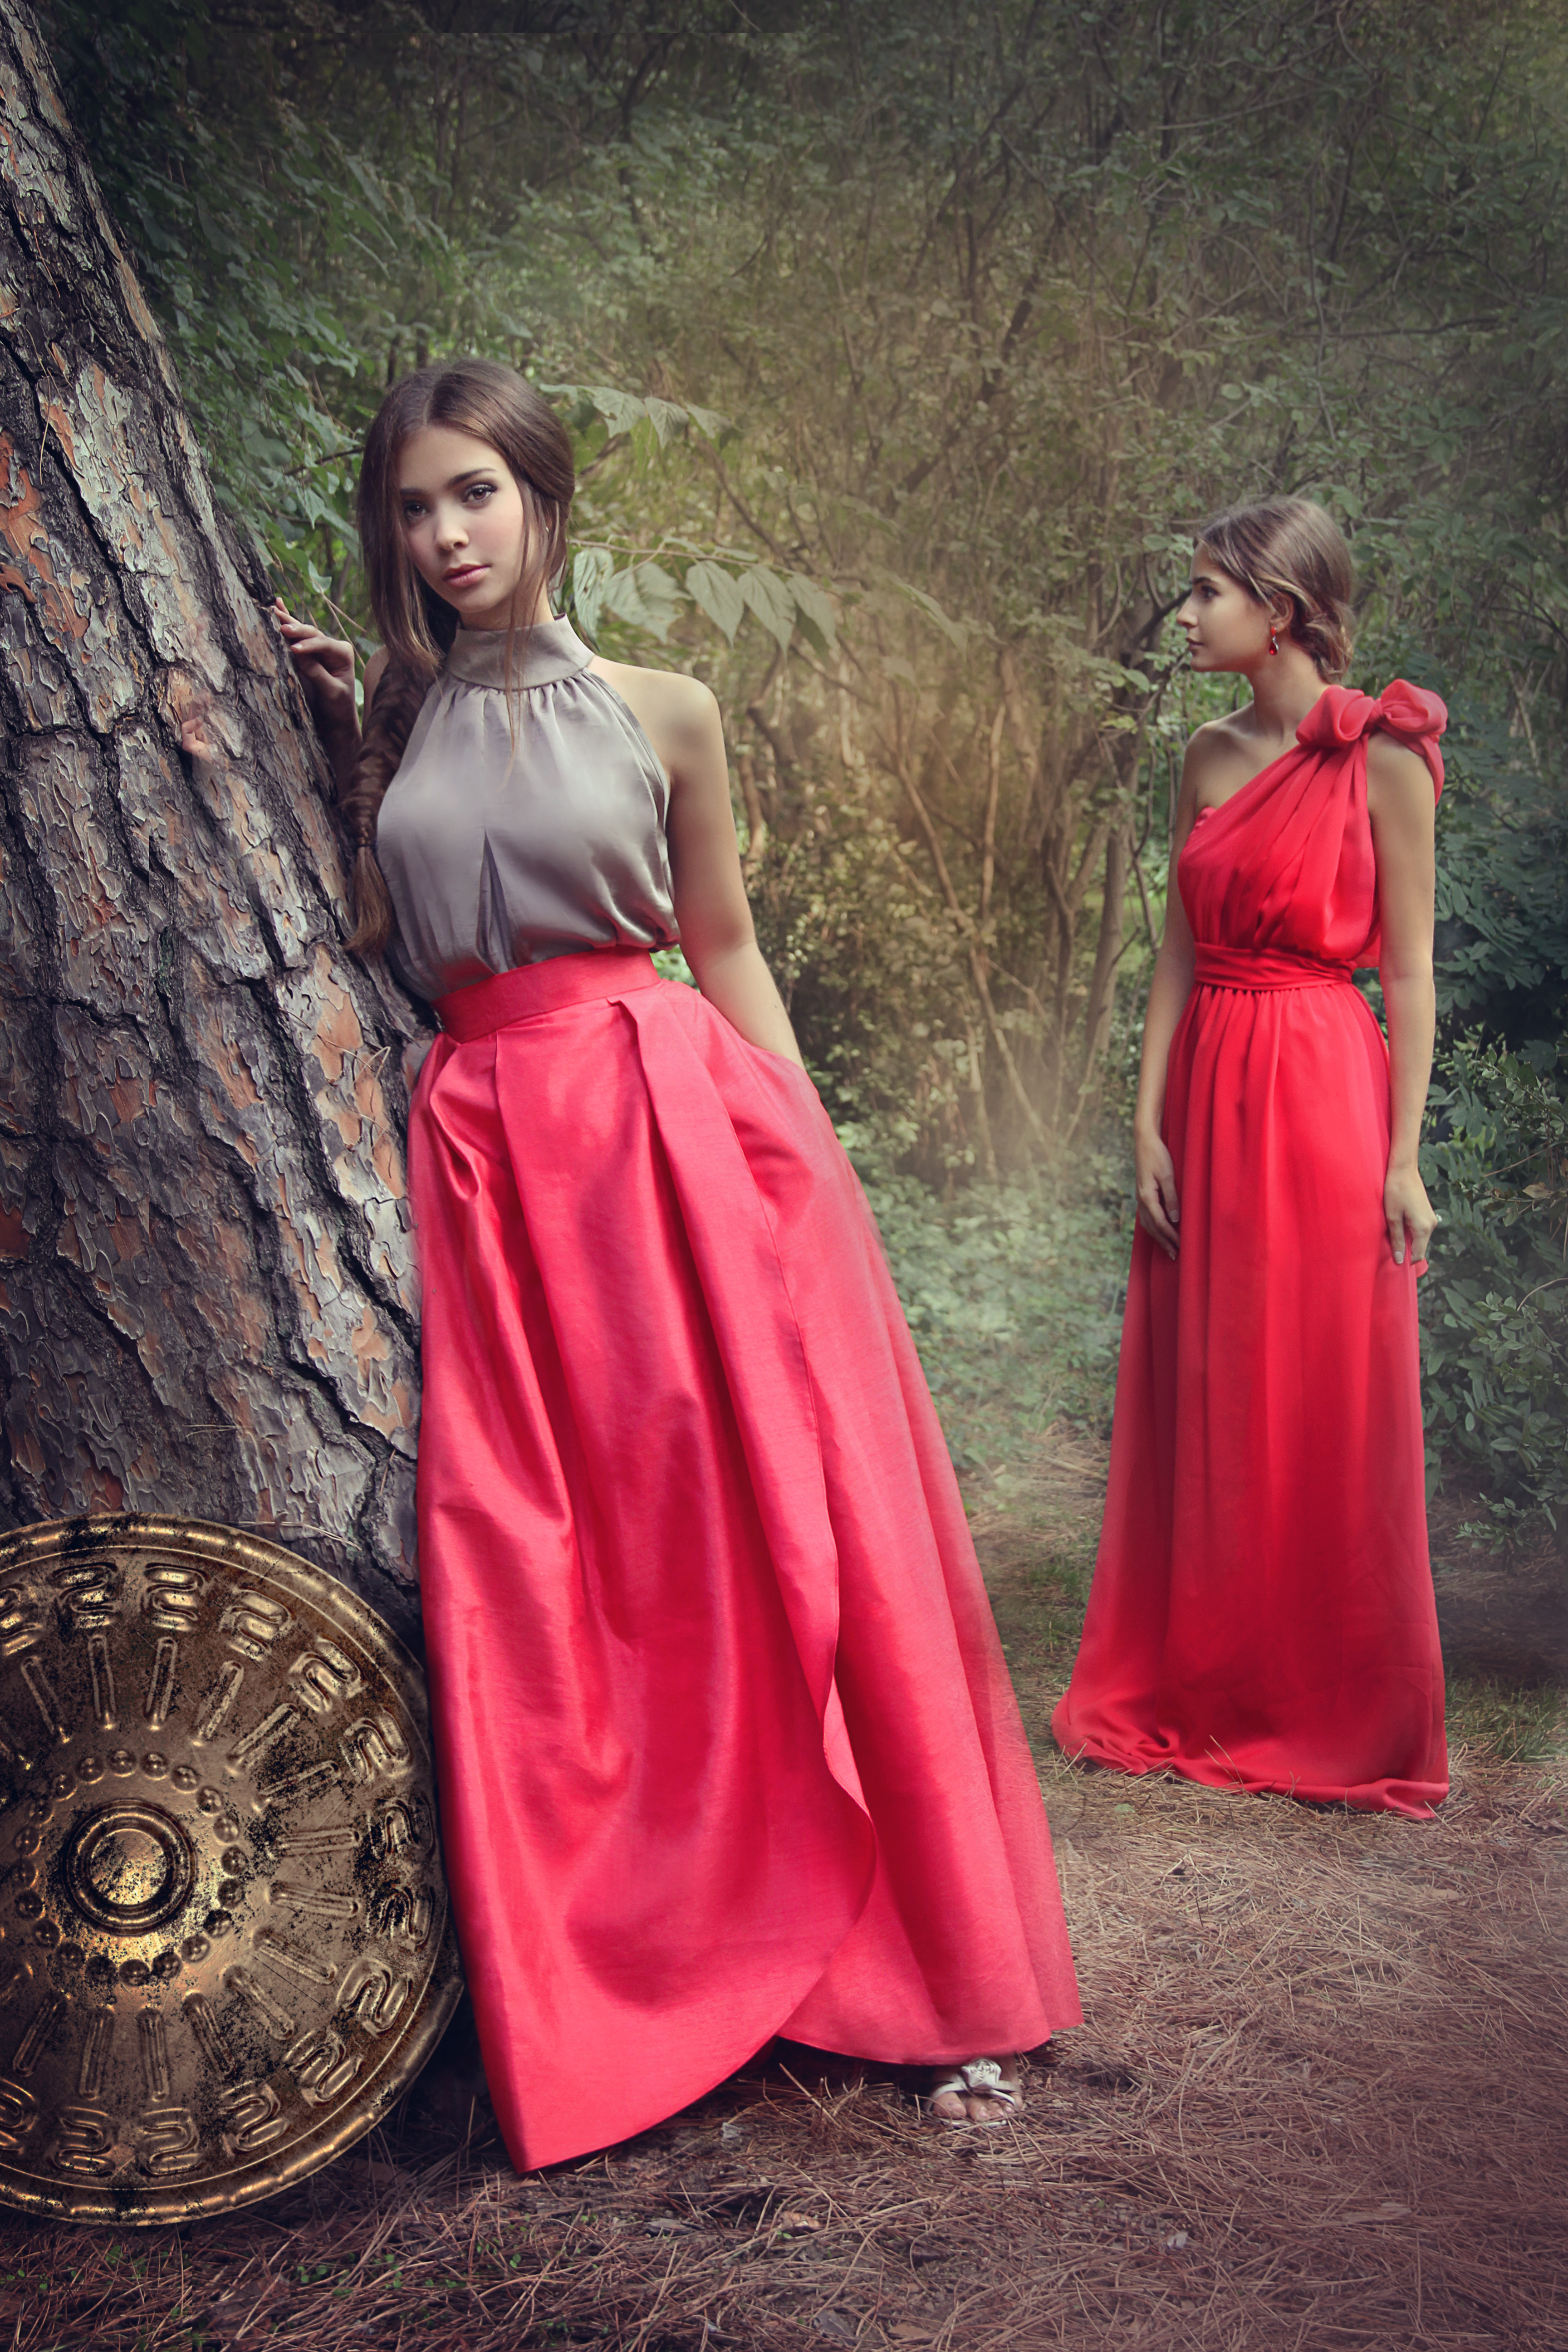 8632edd54 CATALOGO FALDA VICTORIA ROJA Y VESTIDO ATENEA ROJO | BCN Fashion Place